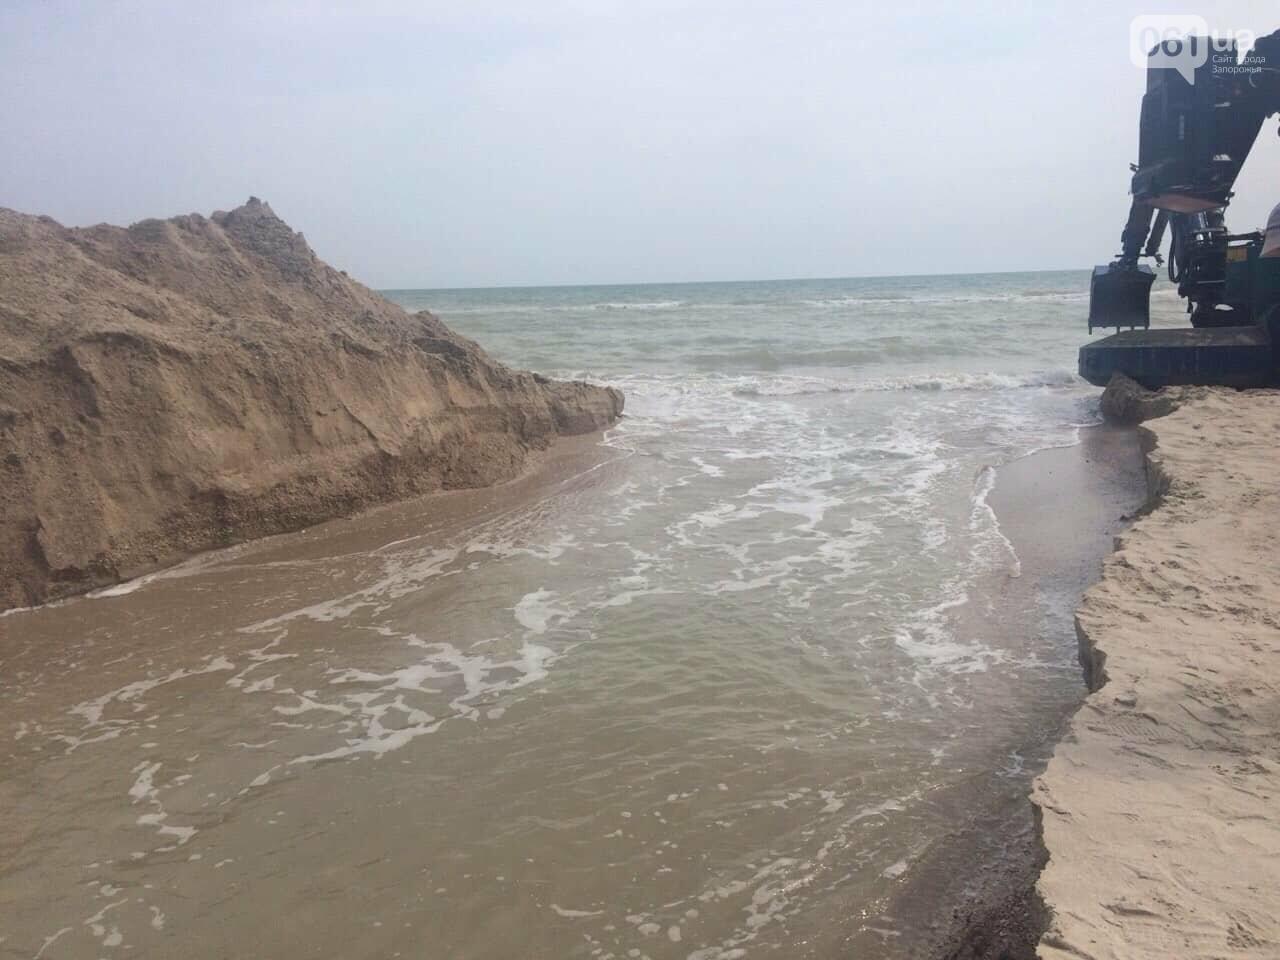 Промоину, соединяющую лиман с Азовским морем, открыли, - ФОТО , фото-5